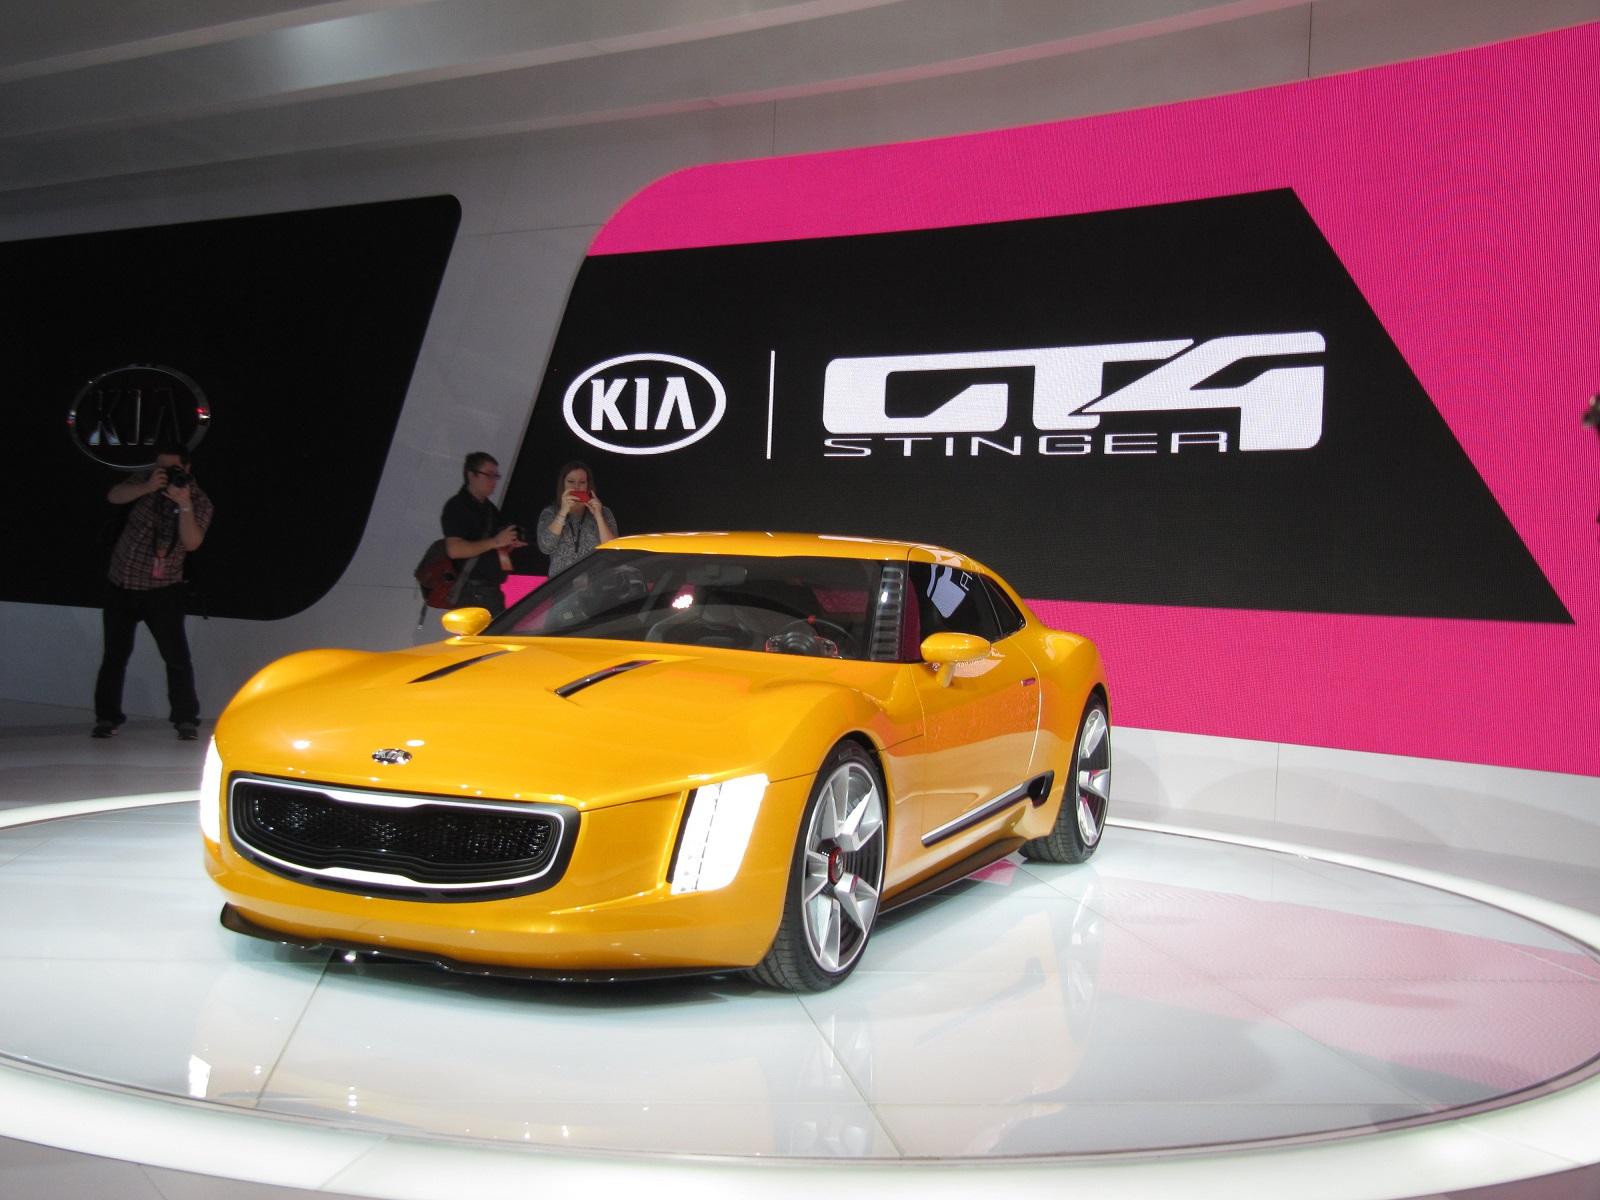 GT4 Stinger Concept Previews New Kia Sports Car: Video